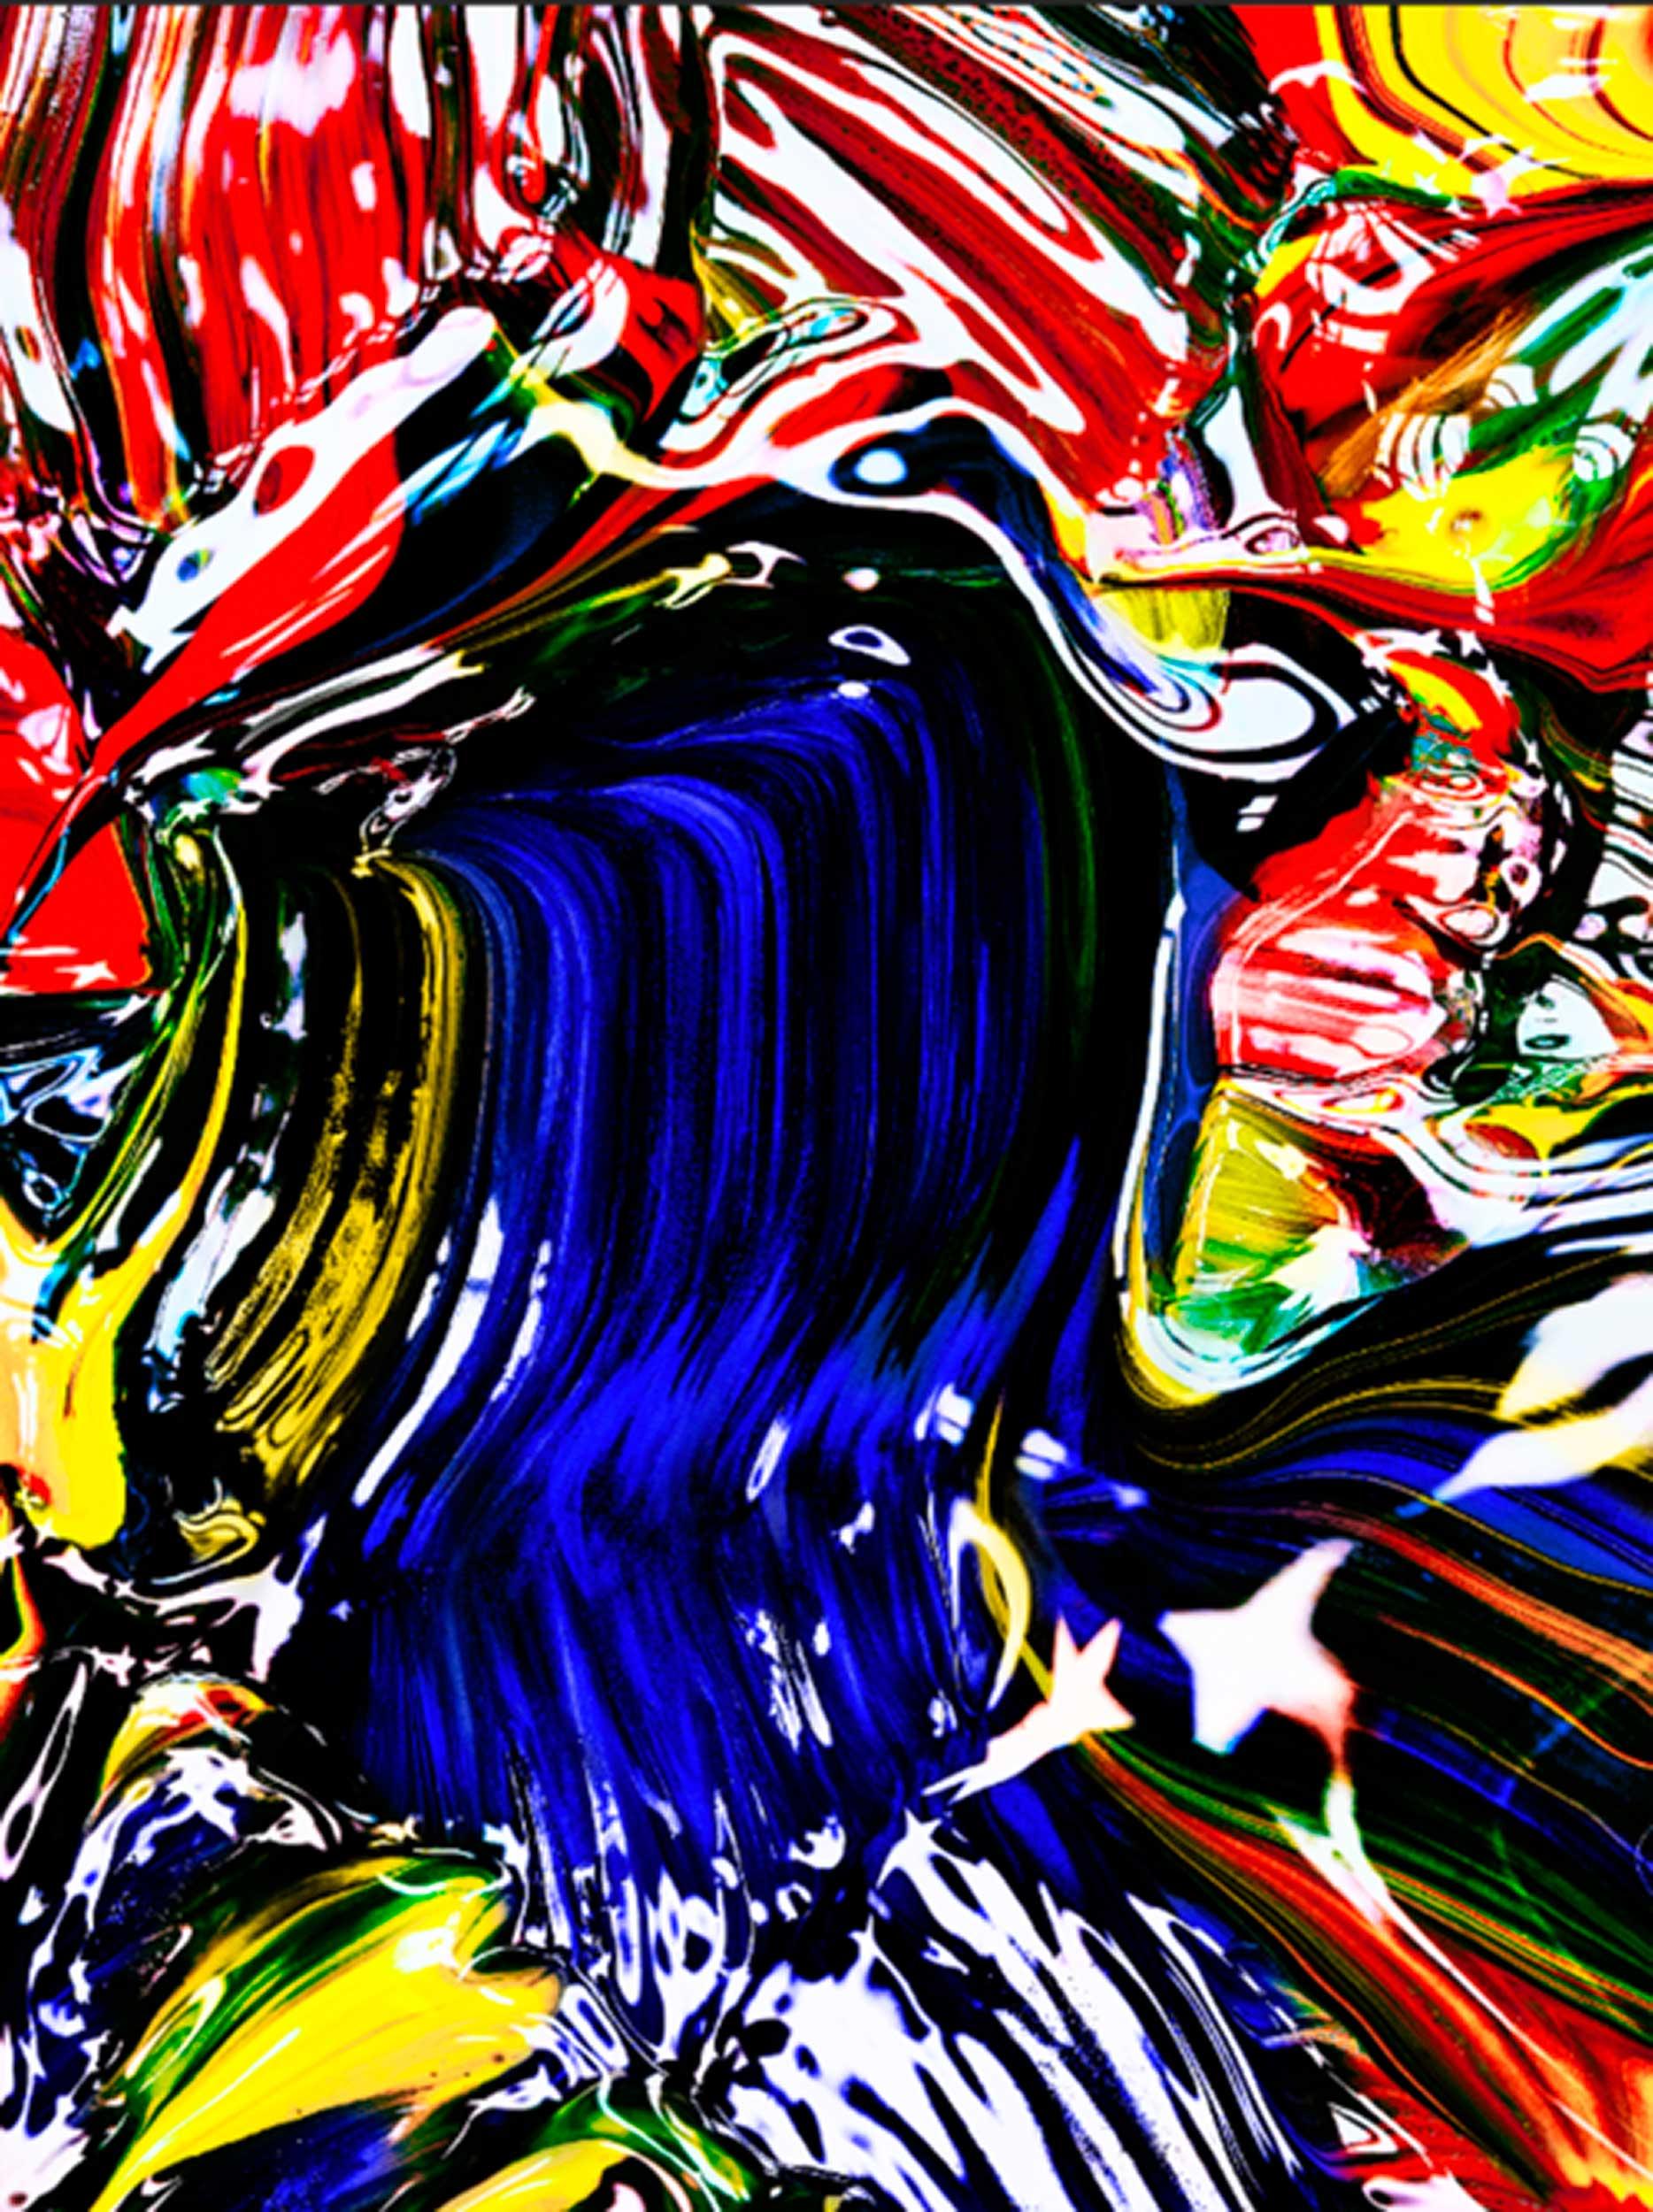 160202_Painting_061.jpg